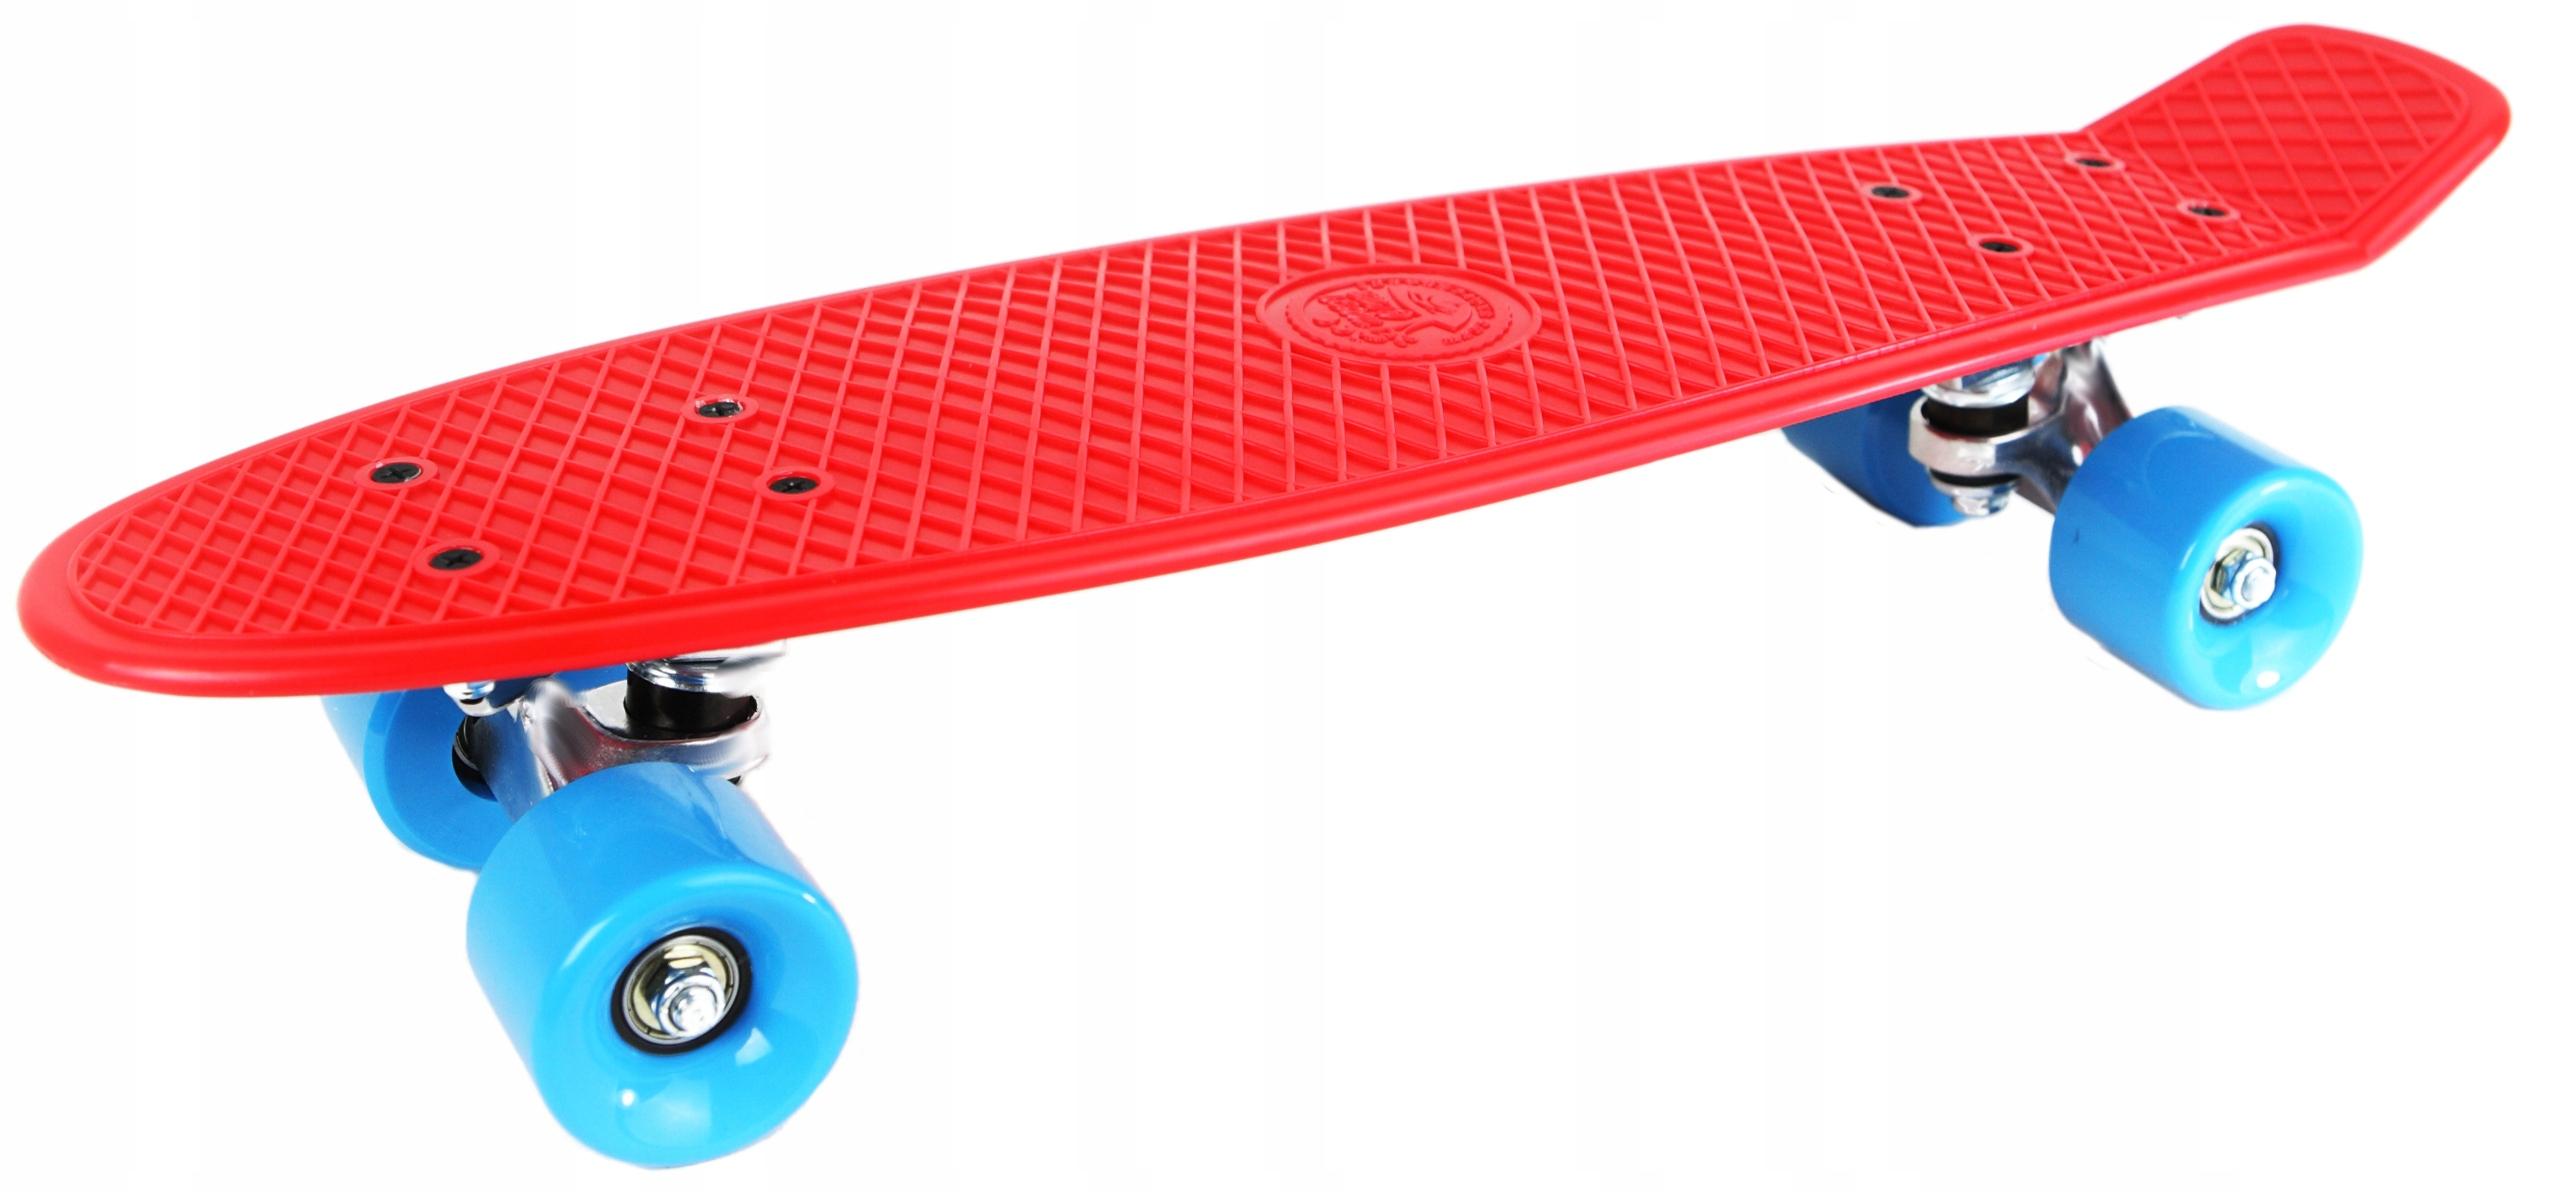 Skateboard Flashle Modi Pique Red Blue